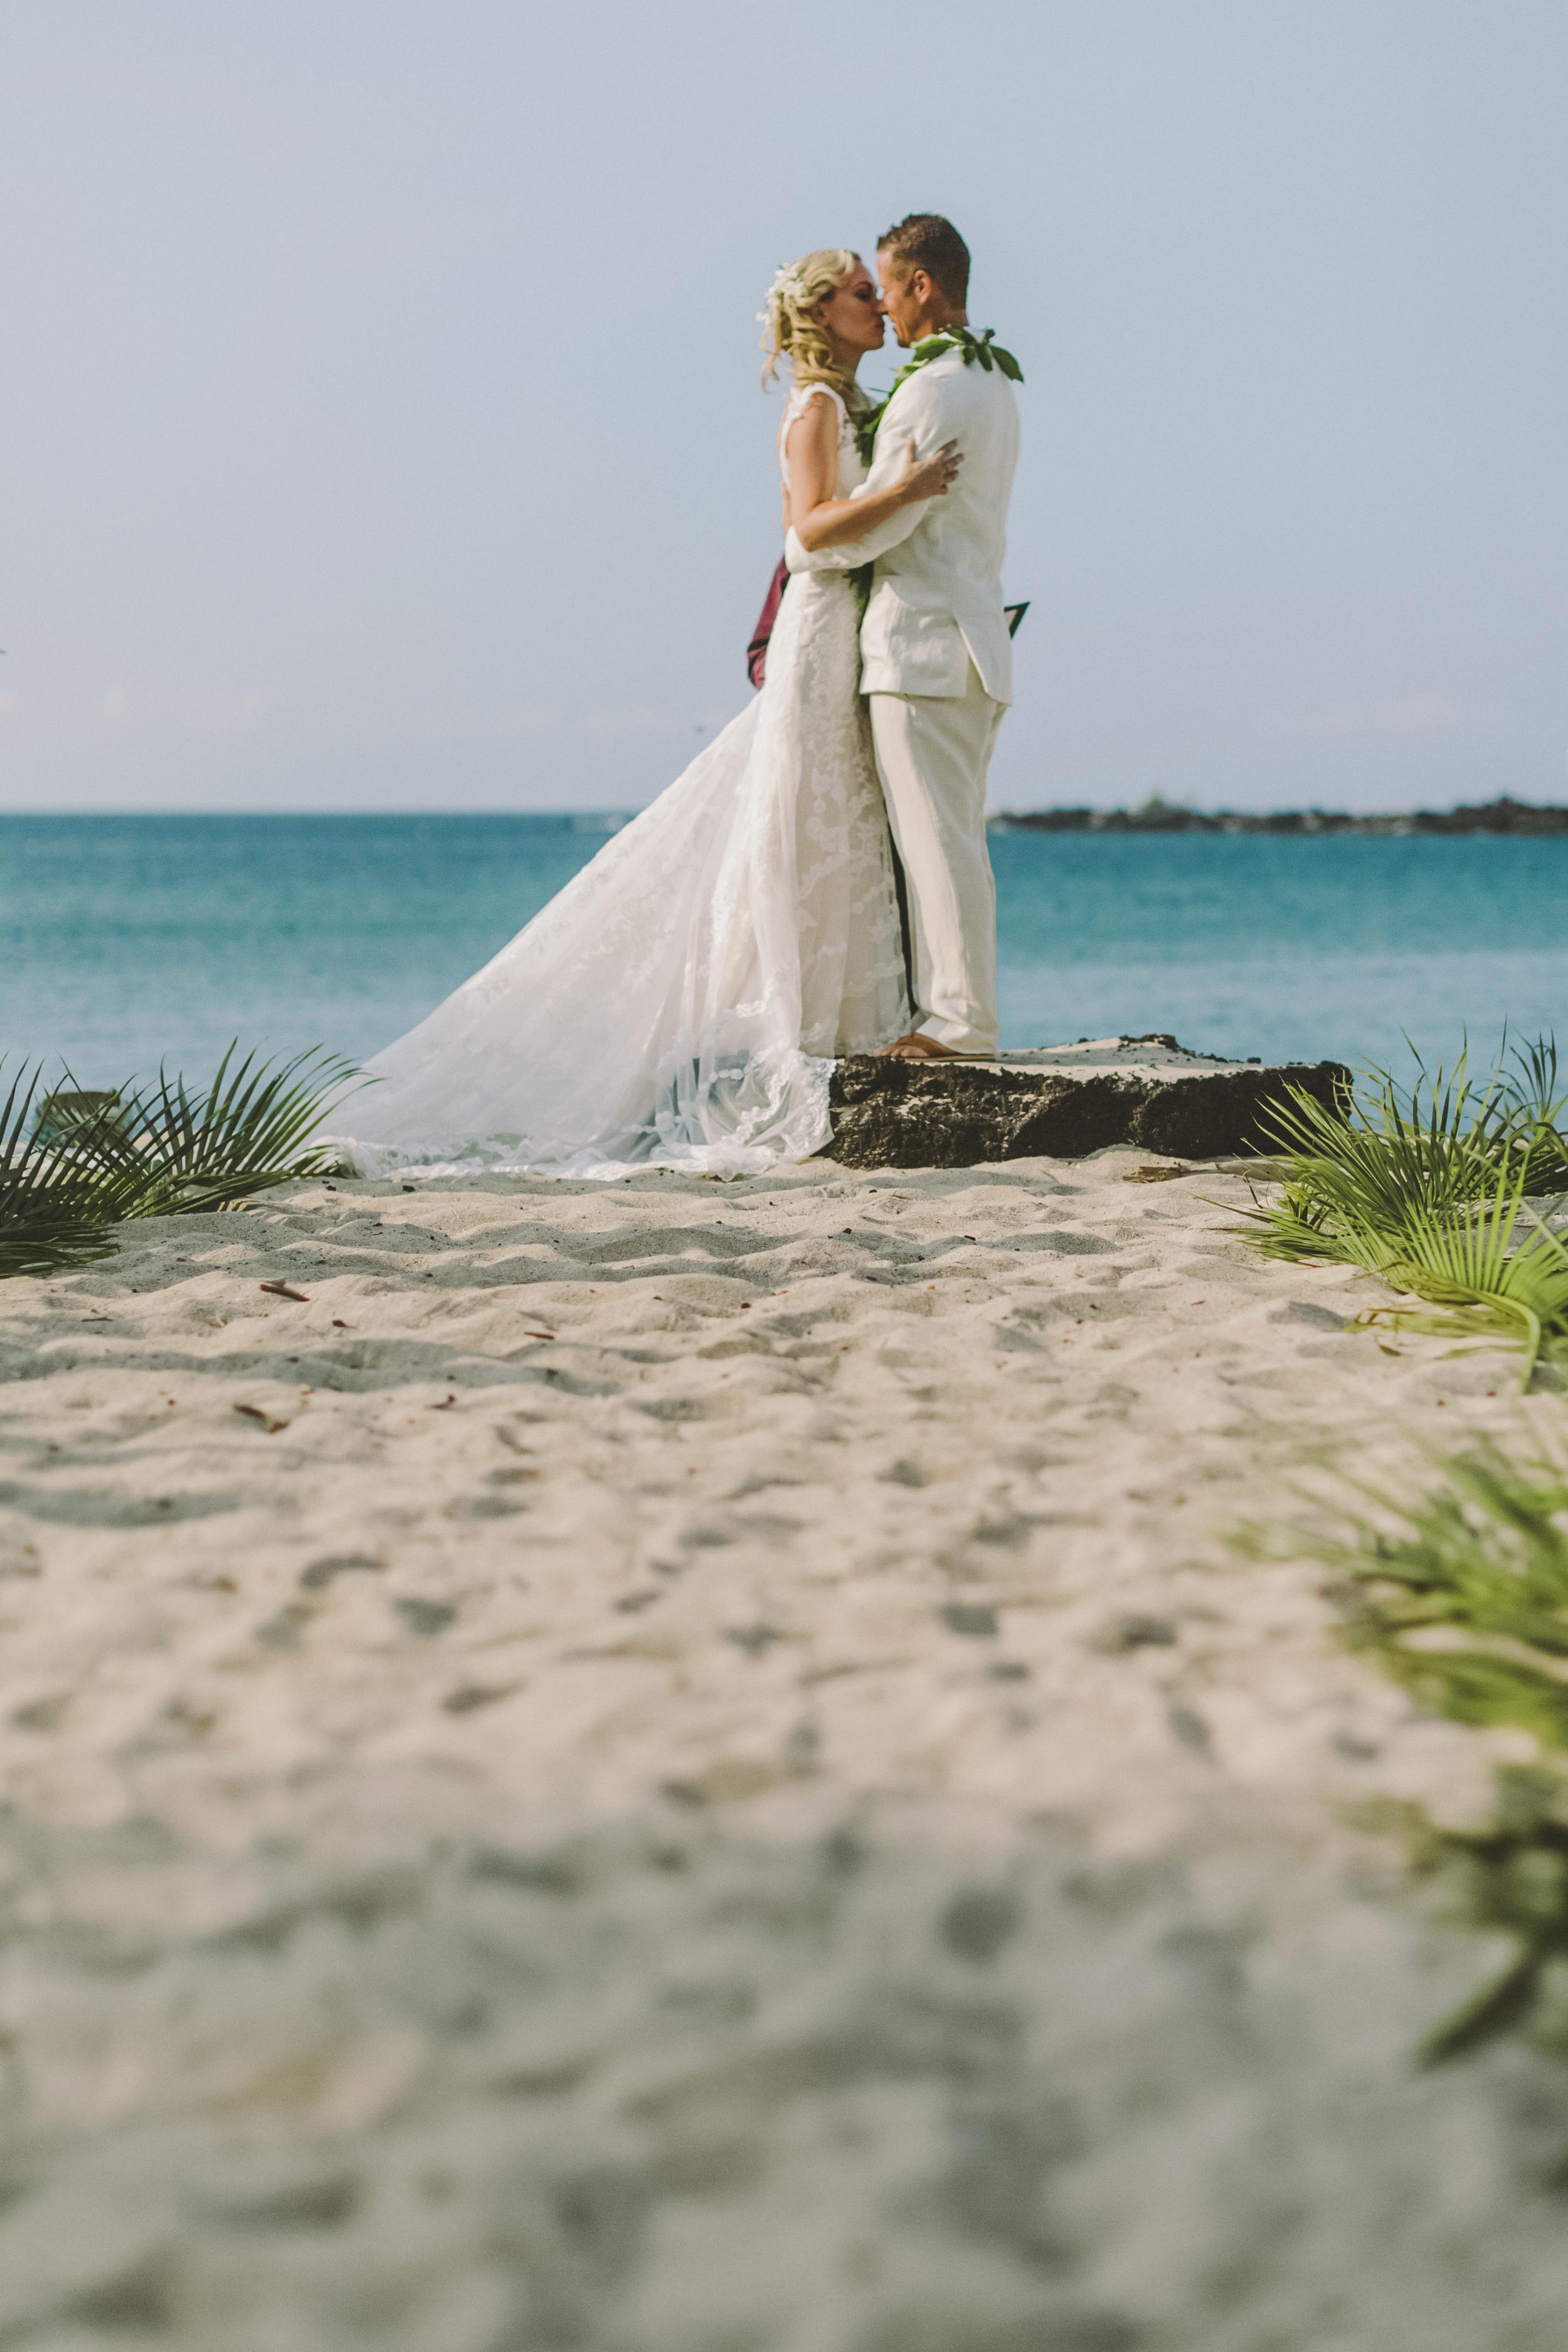 angie-diaz-photography-hawaii-wedding-photographer-kelli-jay-77.jpg